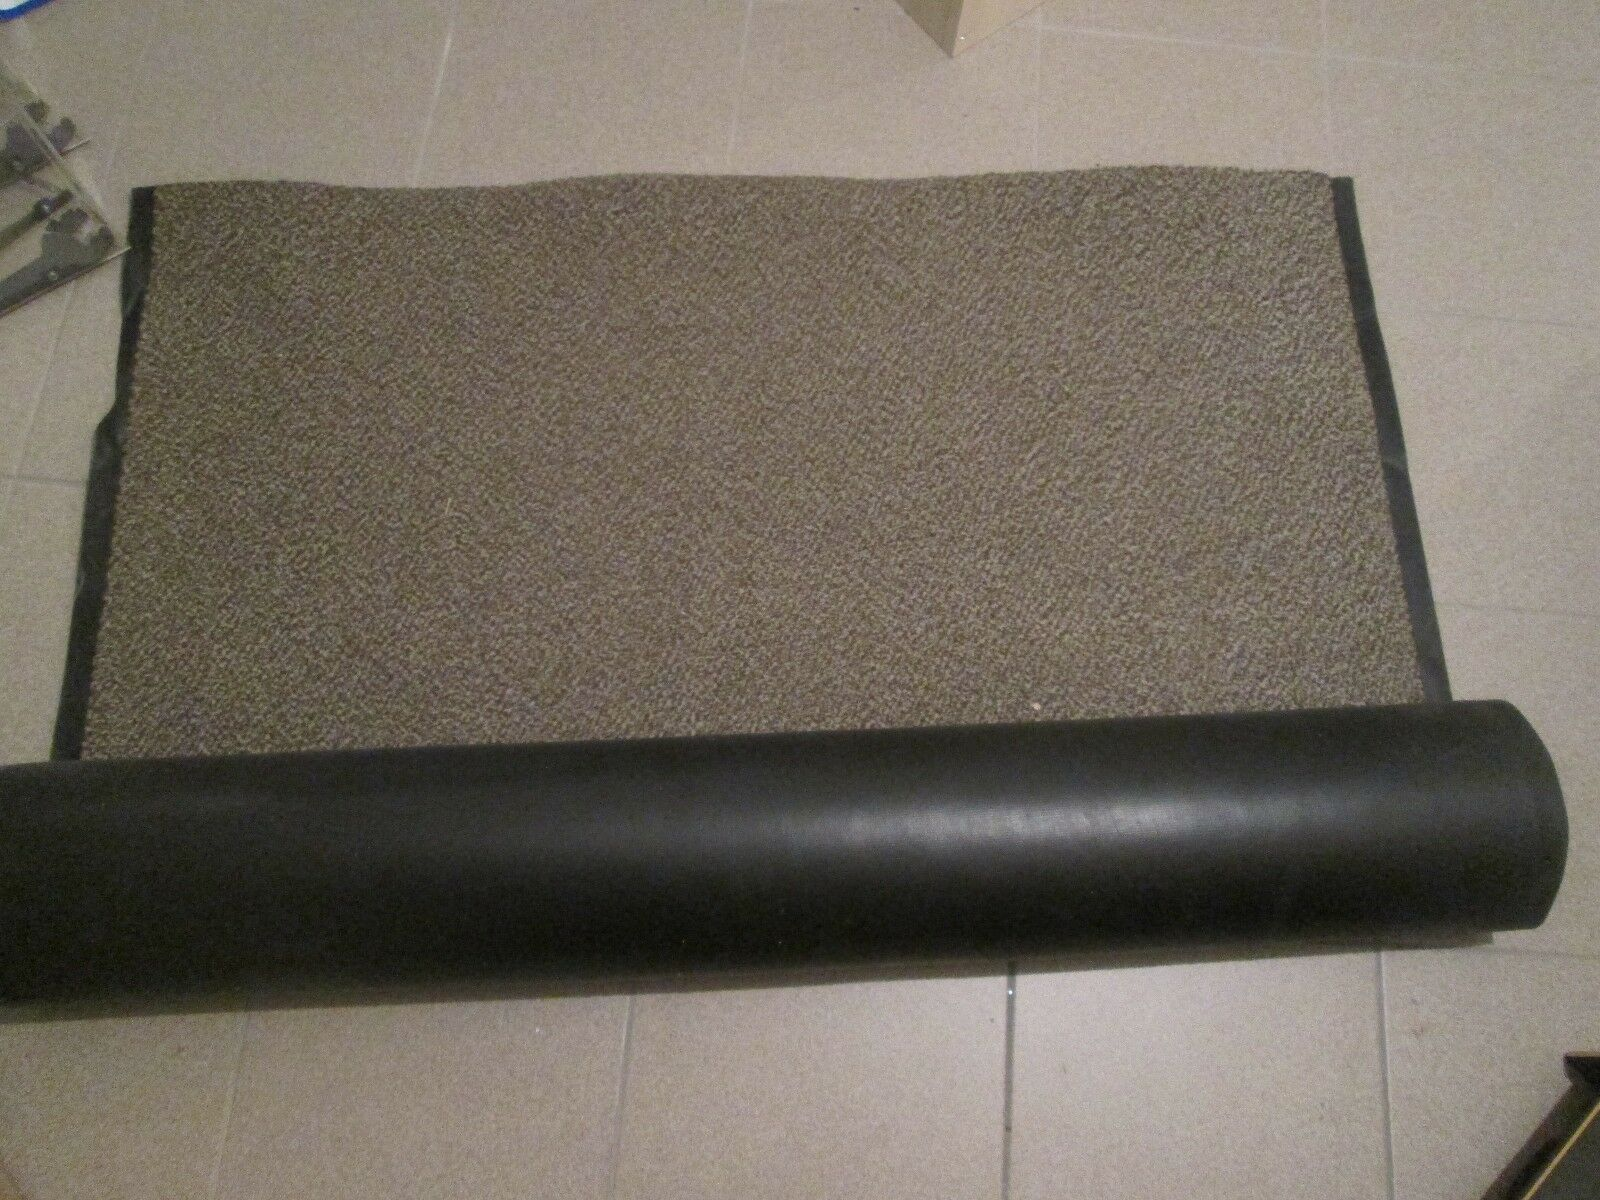 117 x x x 300 cm Grau Teppich,Fußabstreifer,Fußmatte,Türmatte,Bodenmatte c46080